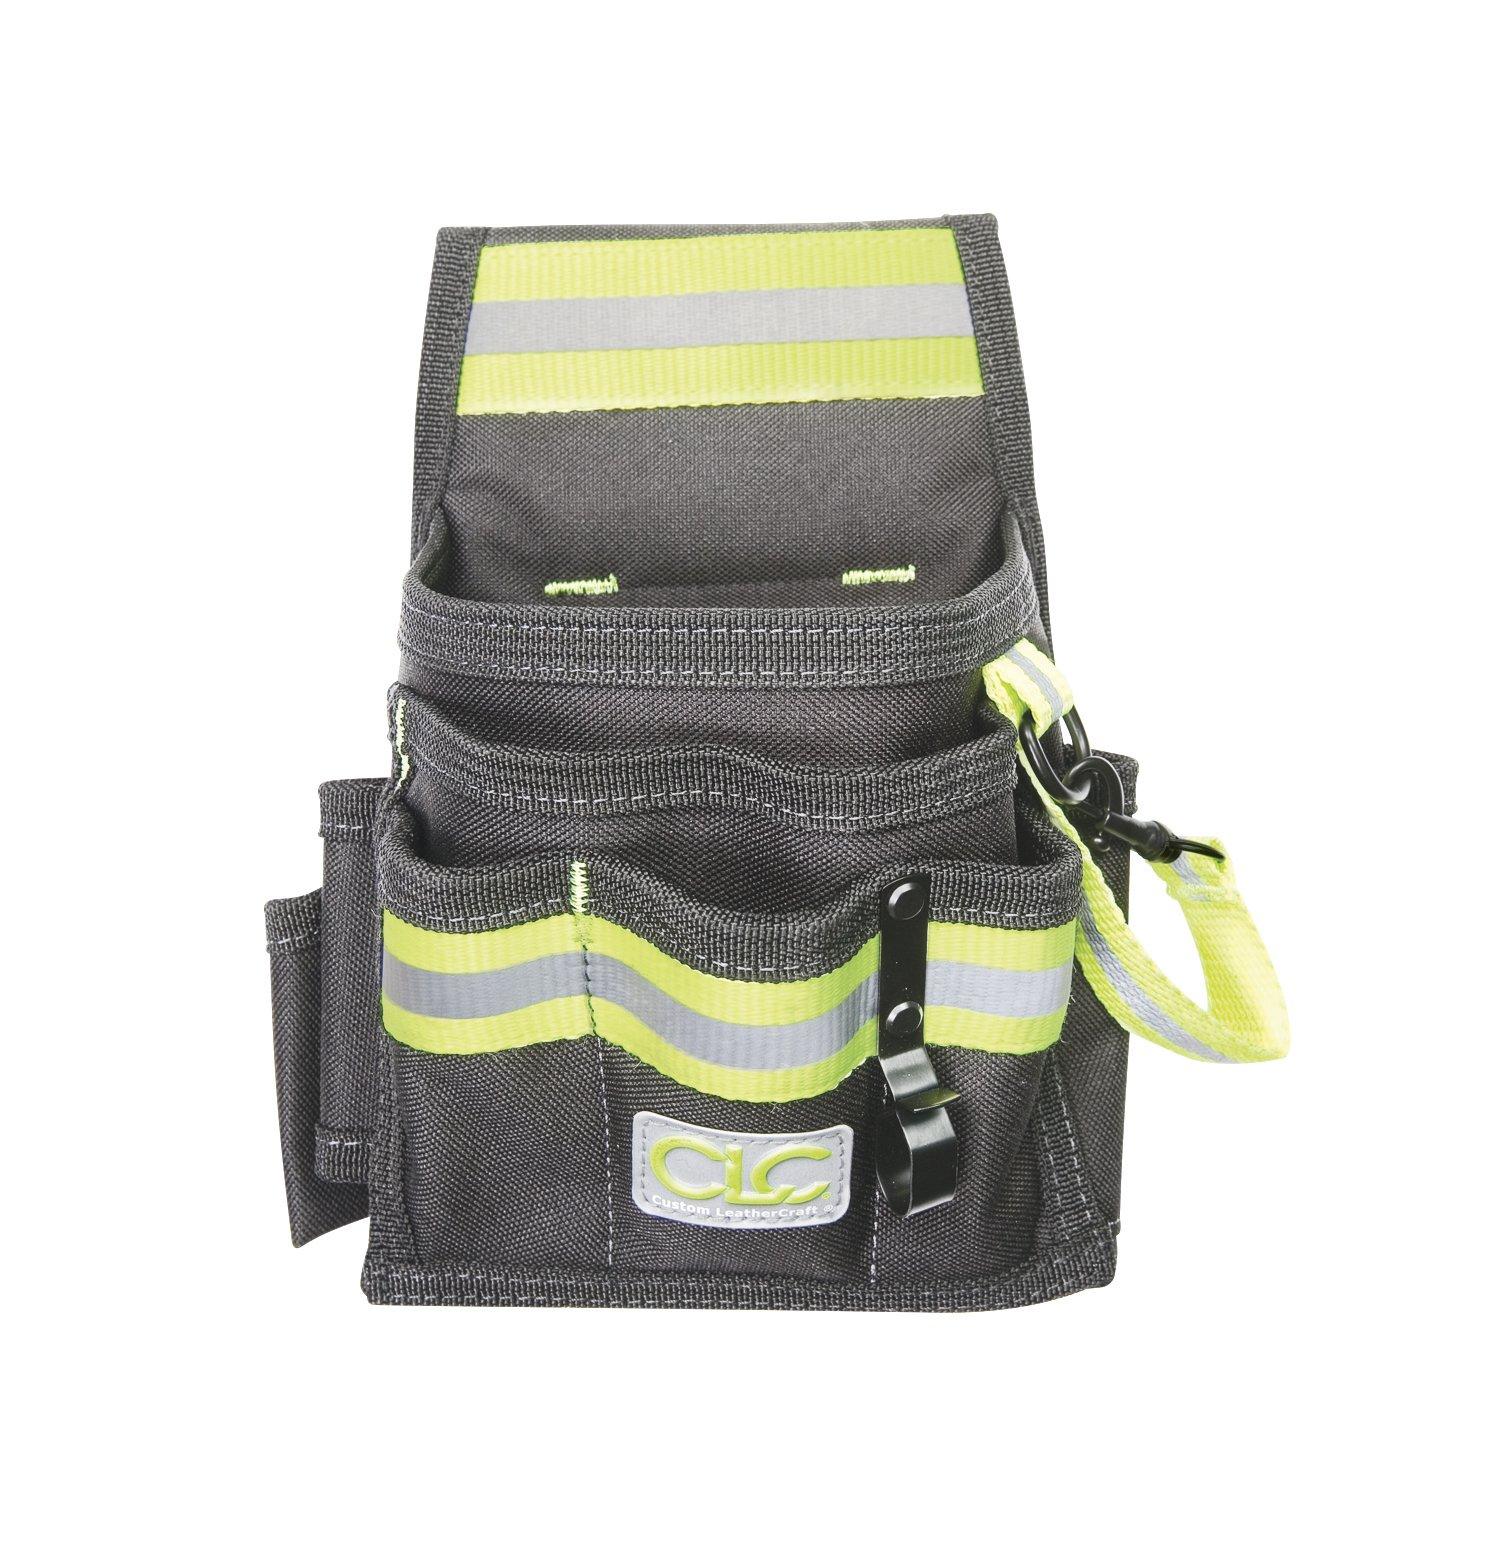 Custom Leathercraft 141503 Hi-Viz 9-Pocket Electrical & Maintenance Pouch by Custom Leathercraft